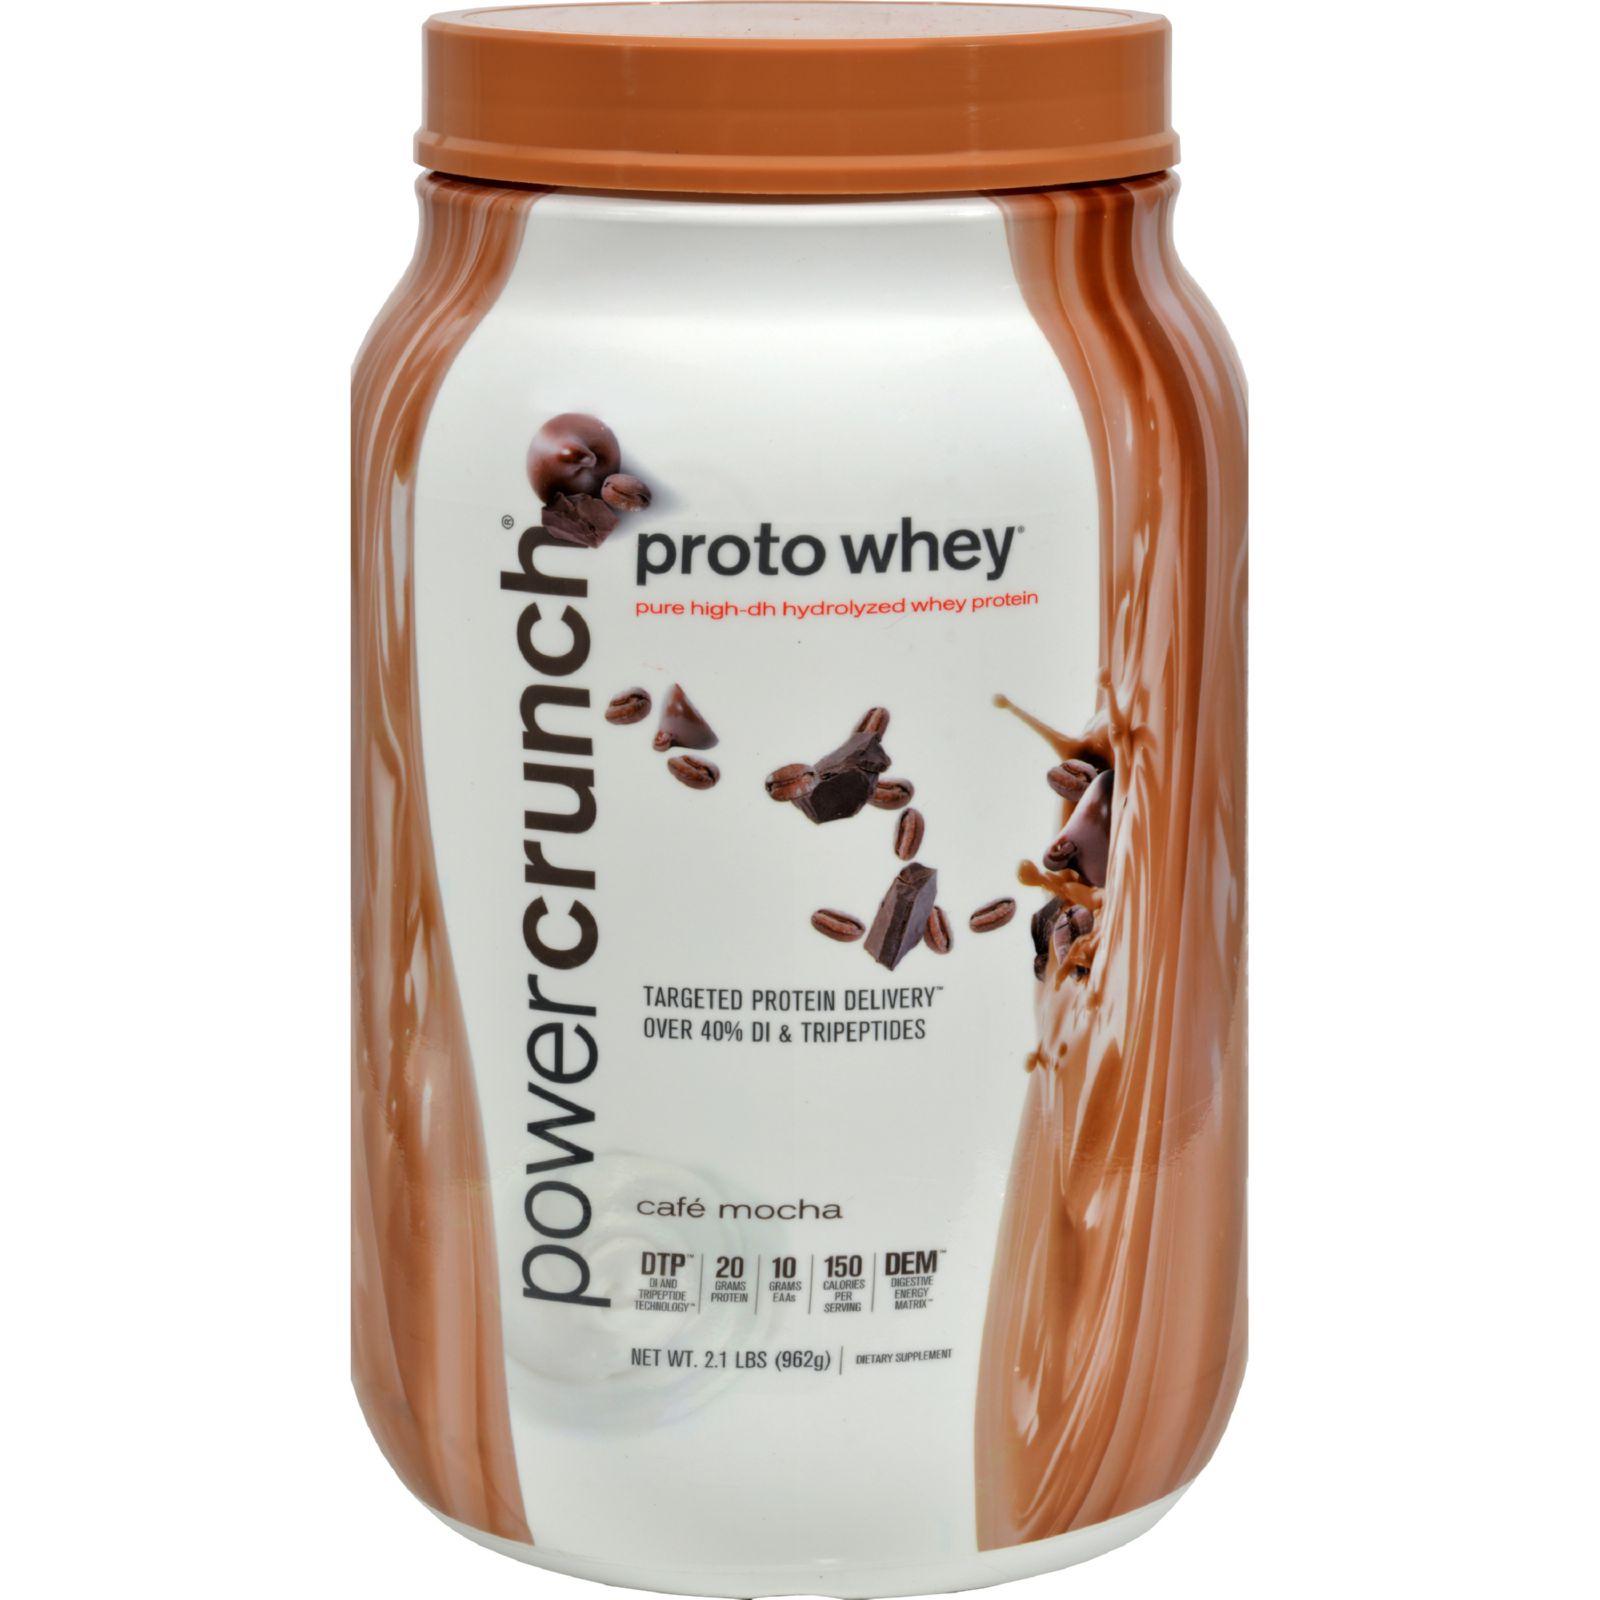 Proto Whey Protein Powder - Cafe Mocha - 2 Lbs